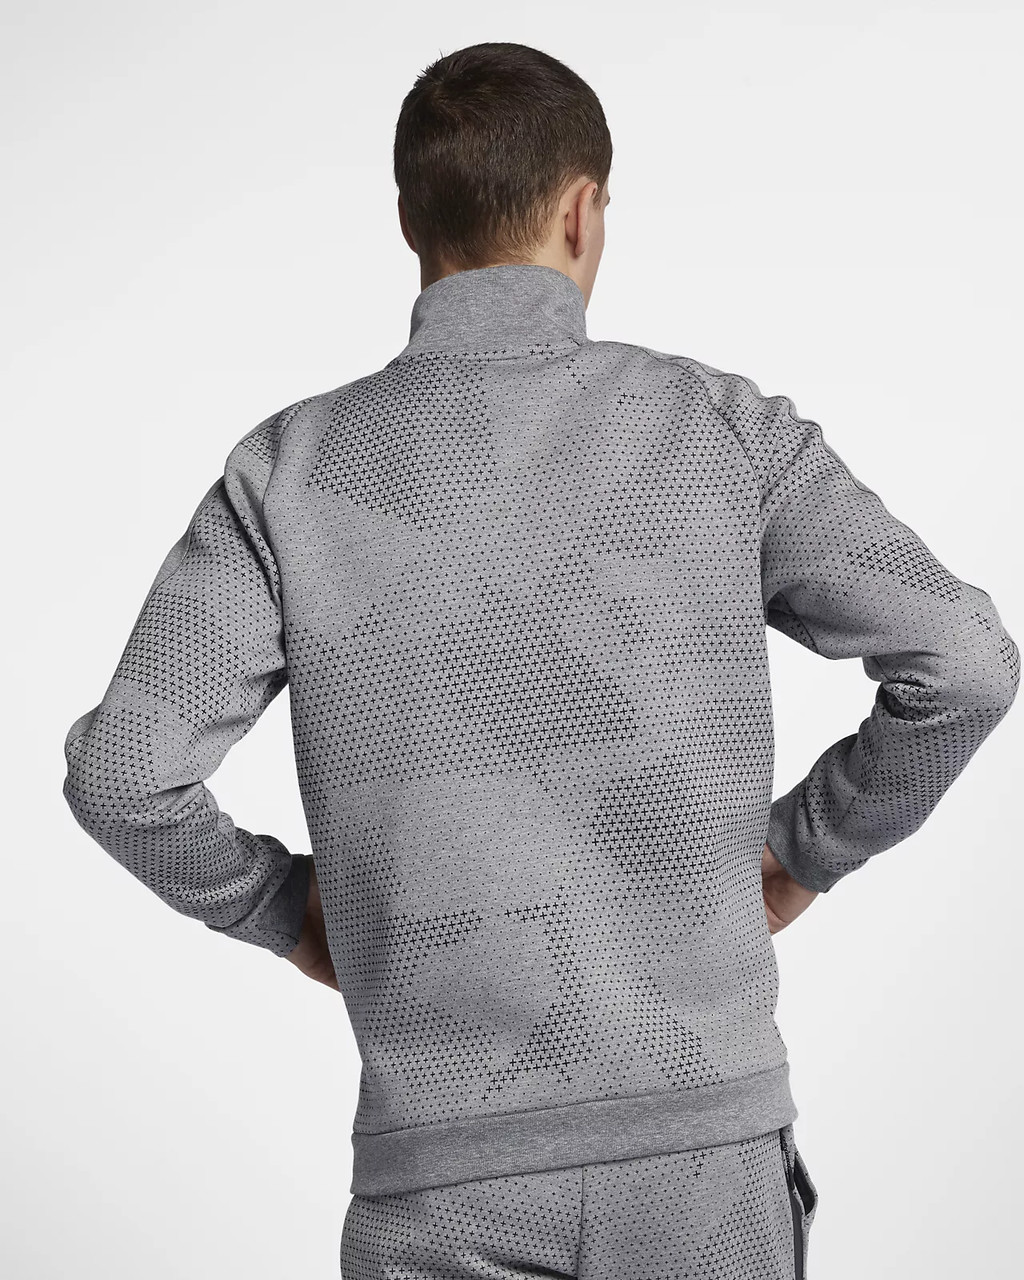 fa7f6a88 Купить Мужская куртка NIKE NSW Tech Fleece GX 1.0 (Артикул: 886172 ...